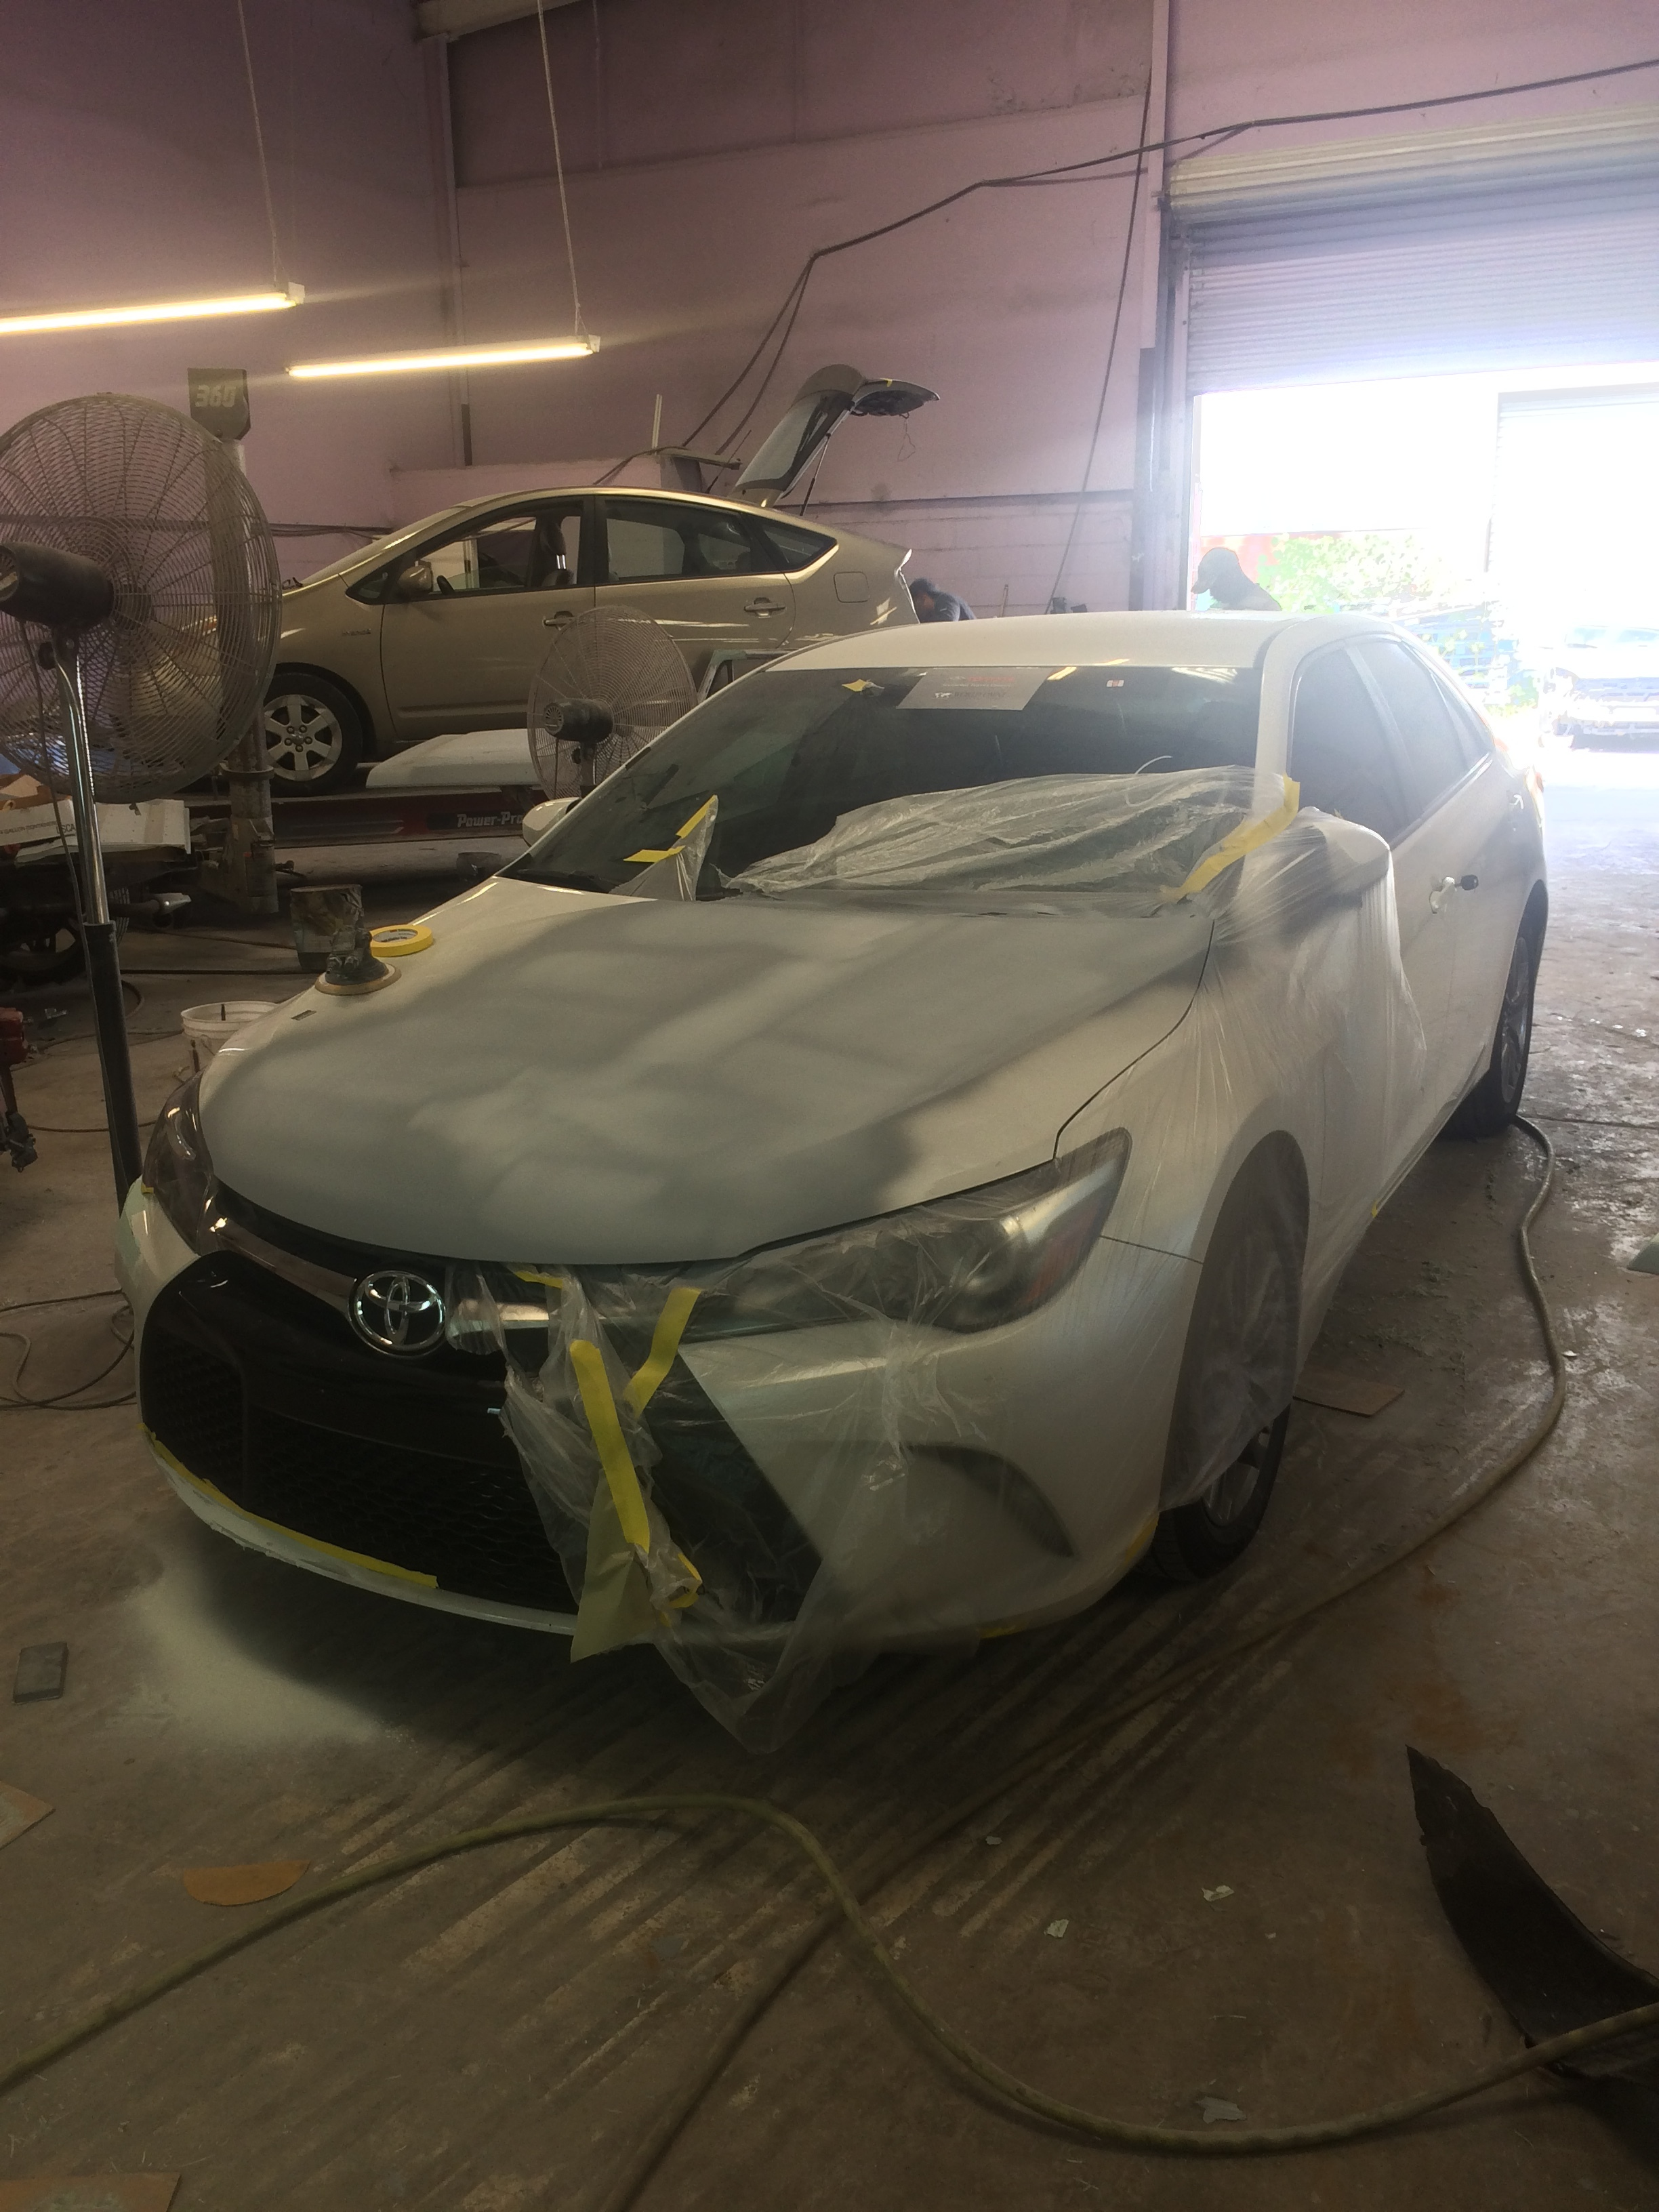 Lawrenceville Toyota Camry Crash